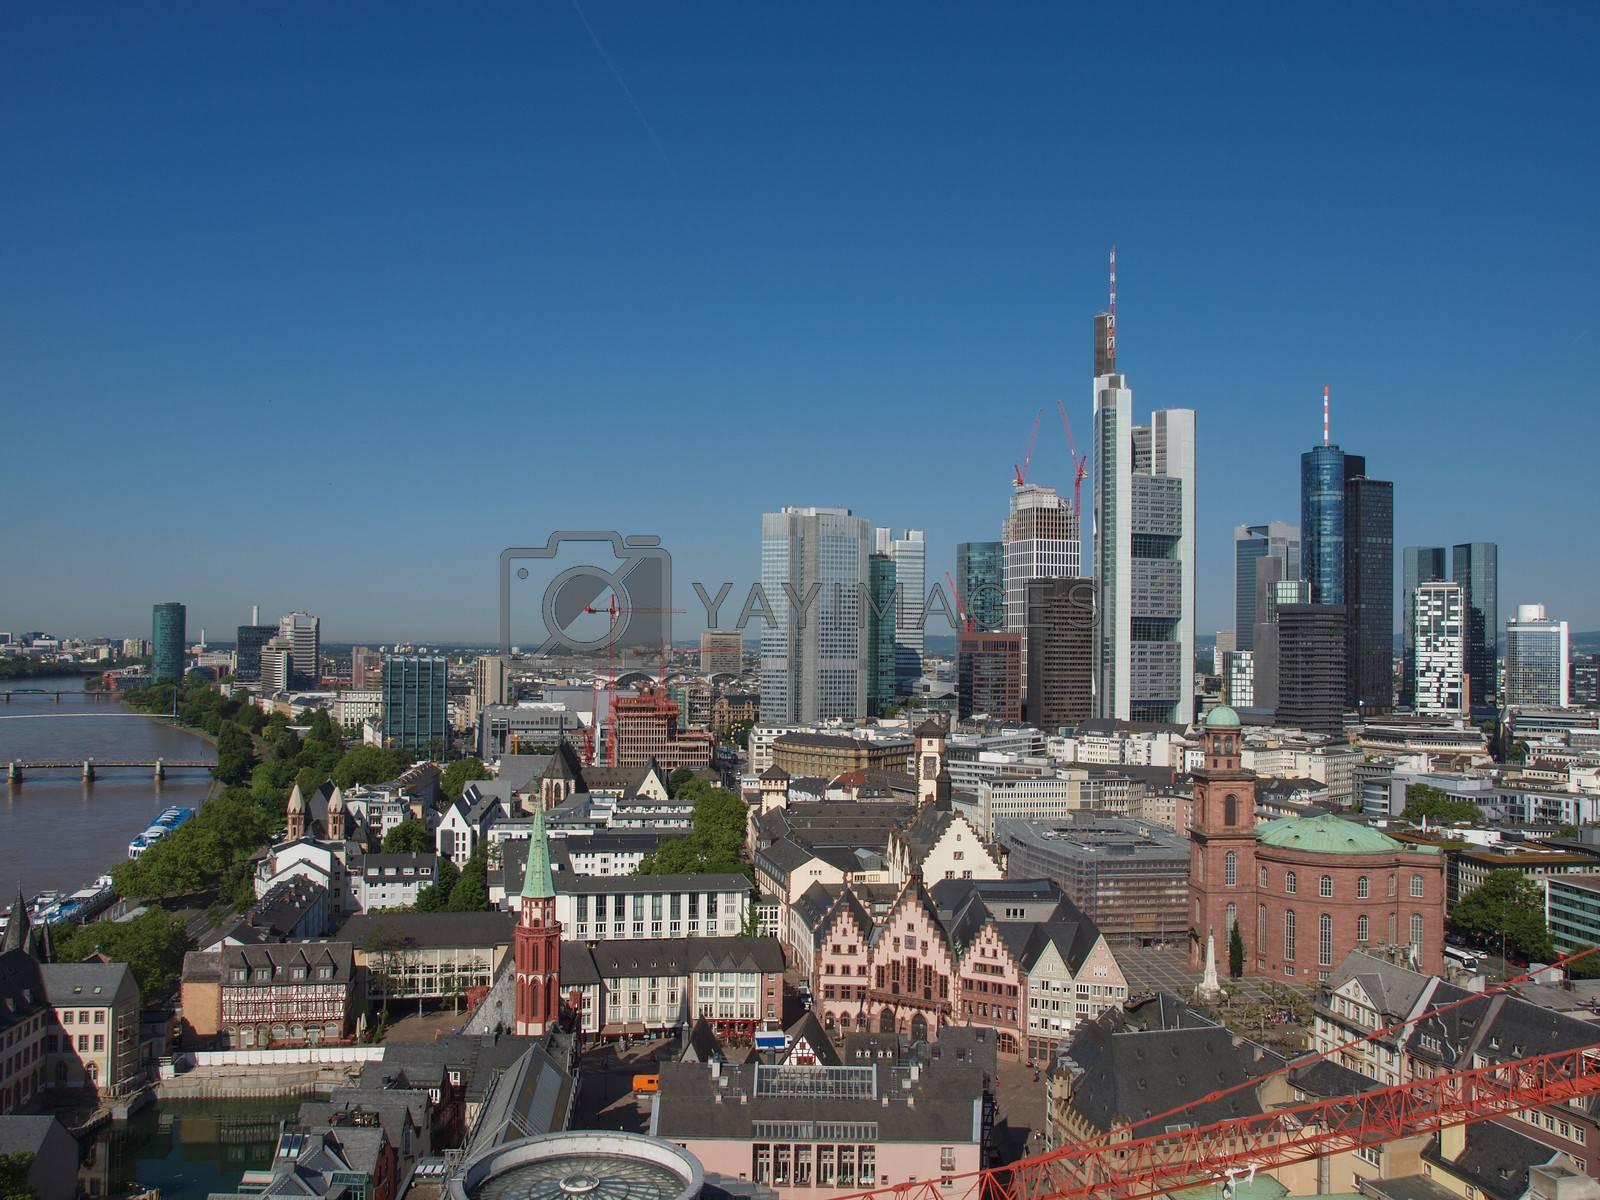 Royalty free image of Frankfurt am Main by claudiodivizia